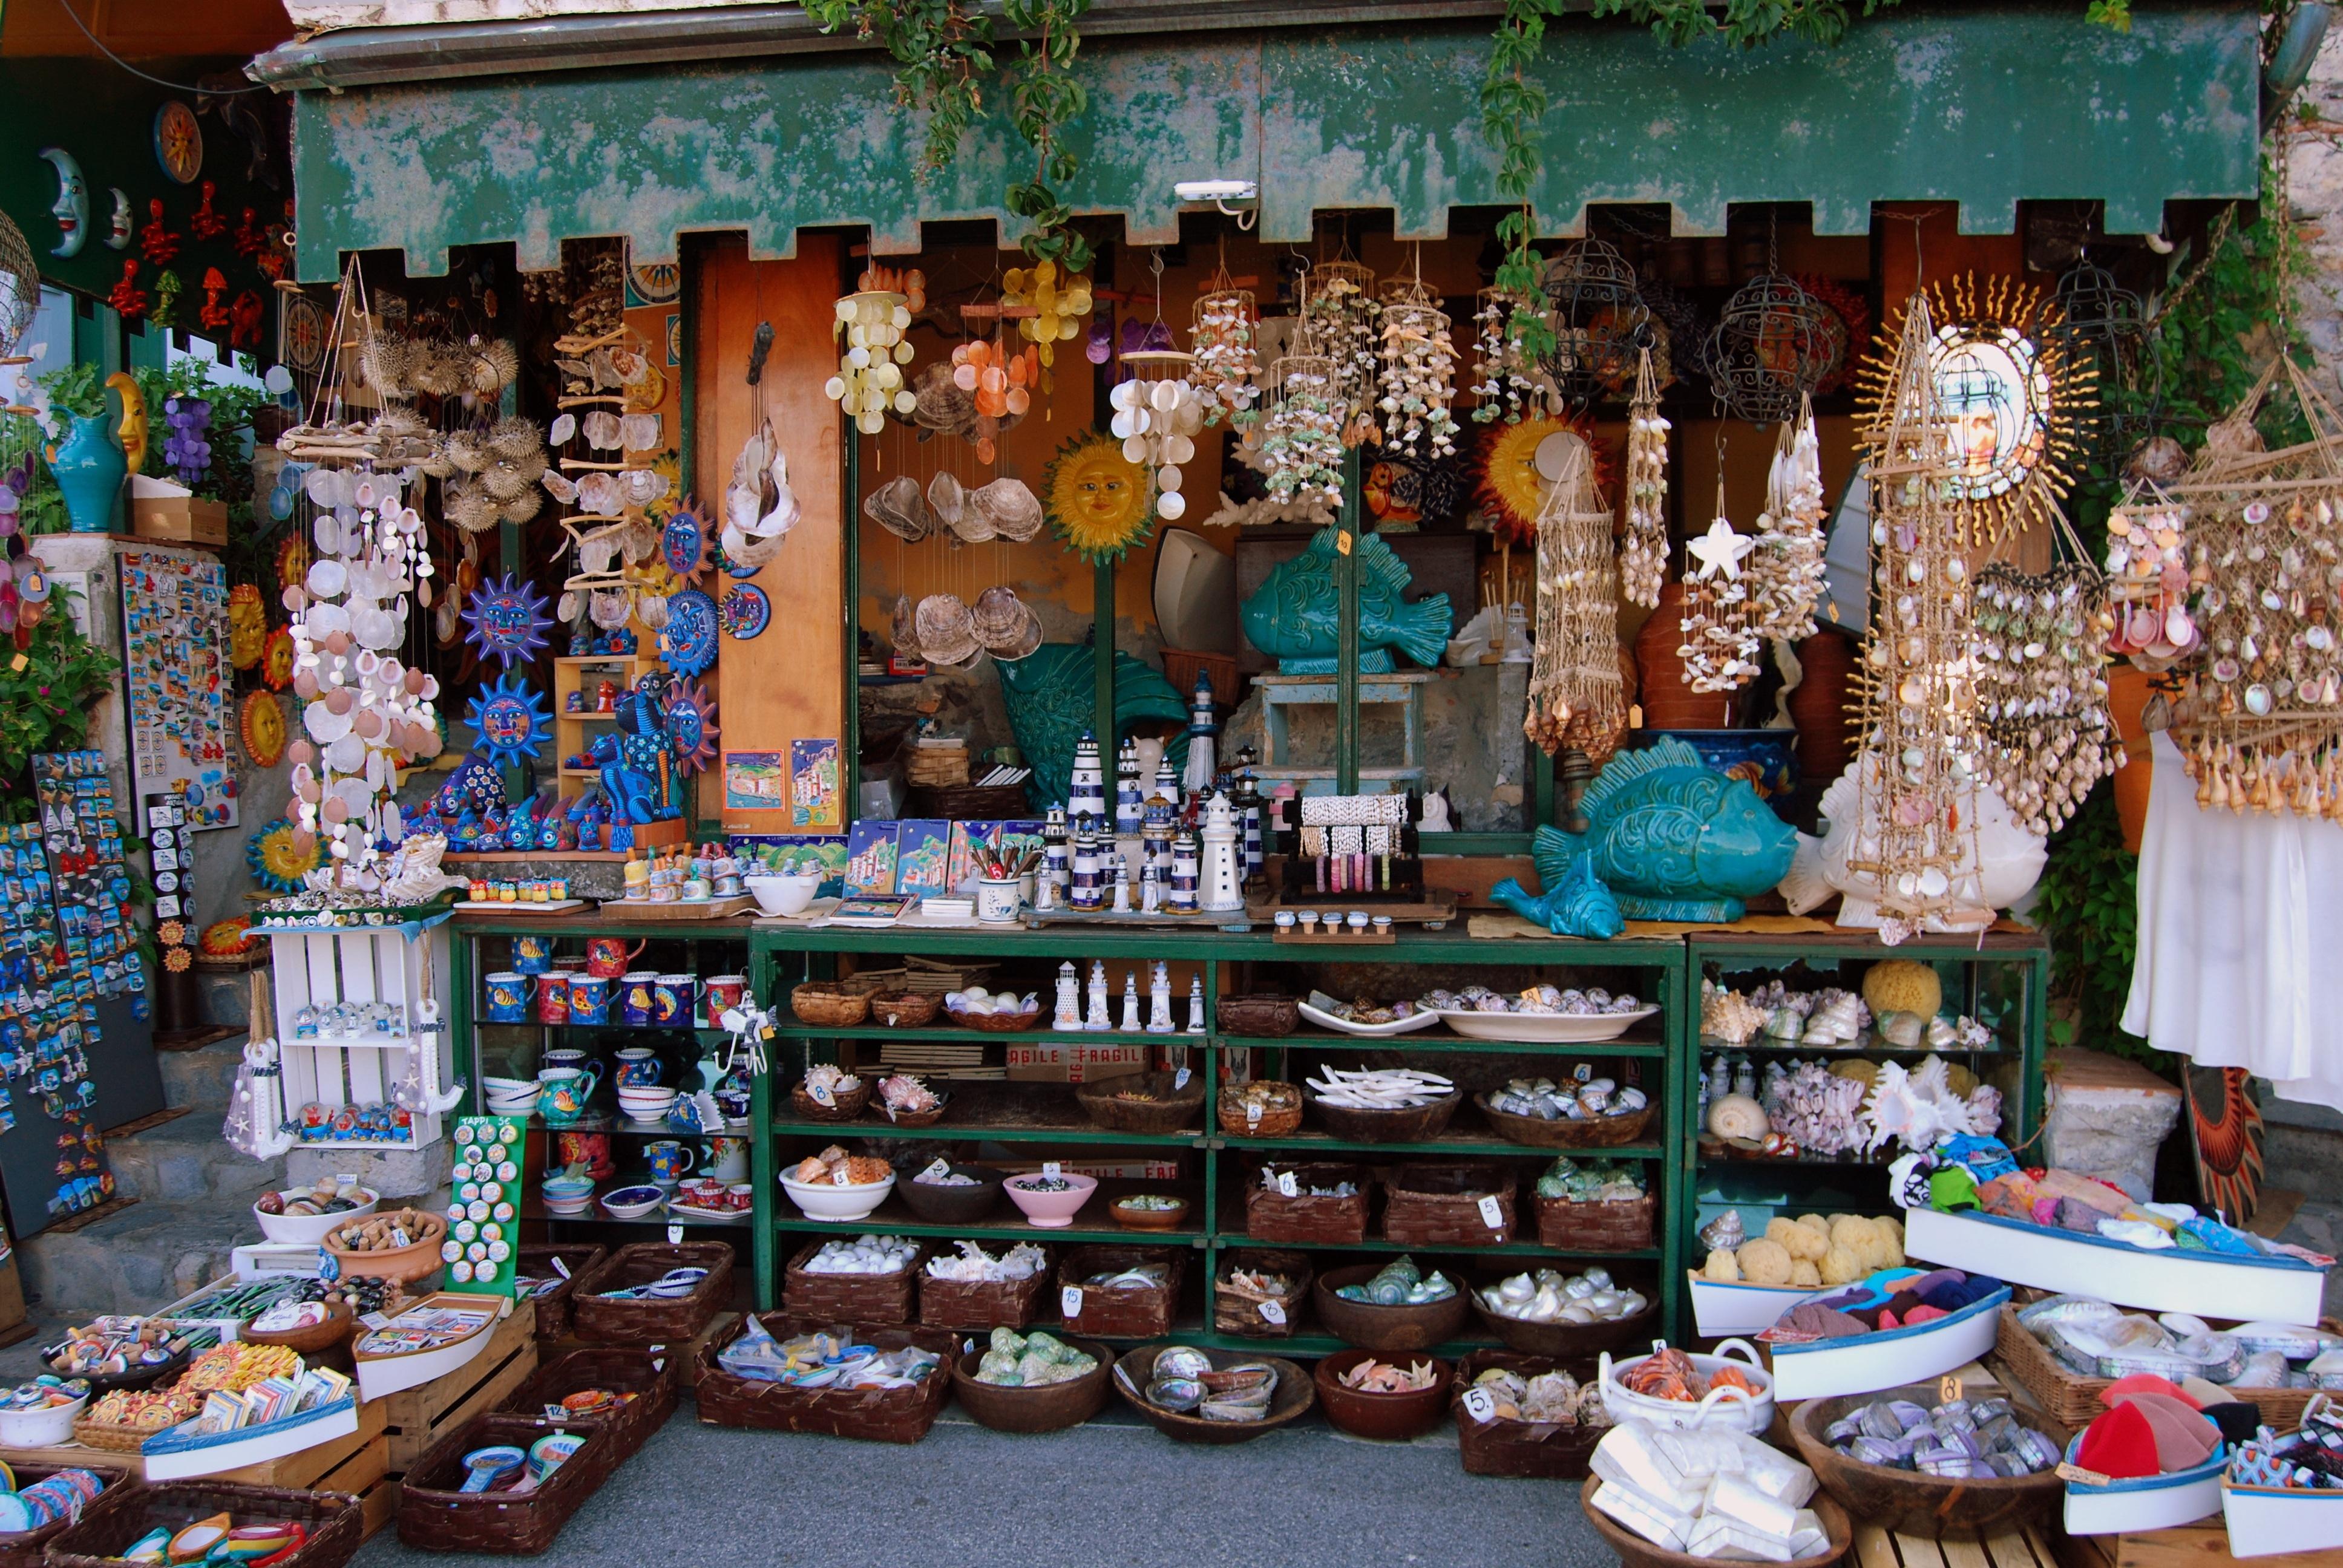 Free Images : city, shop, vendor, italy, bazaar, market